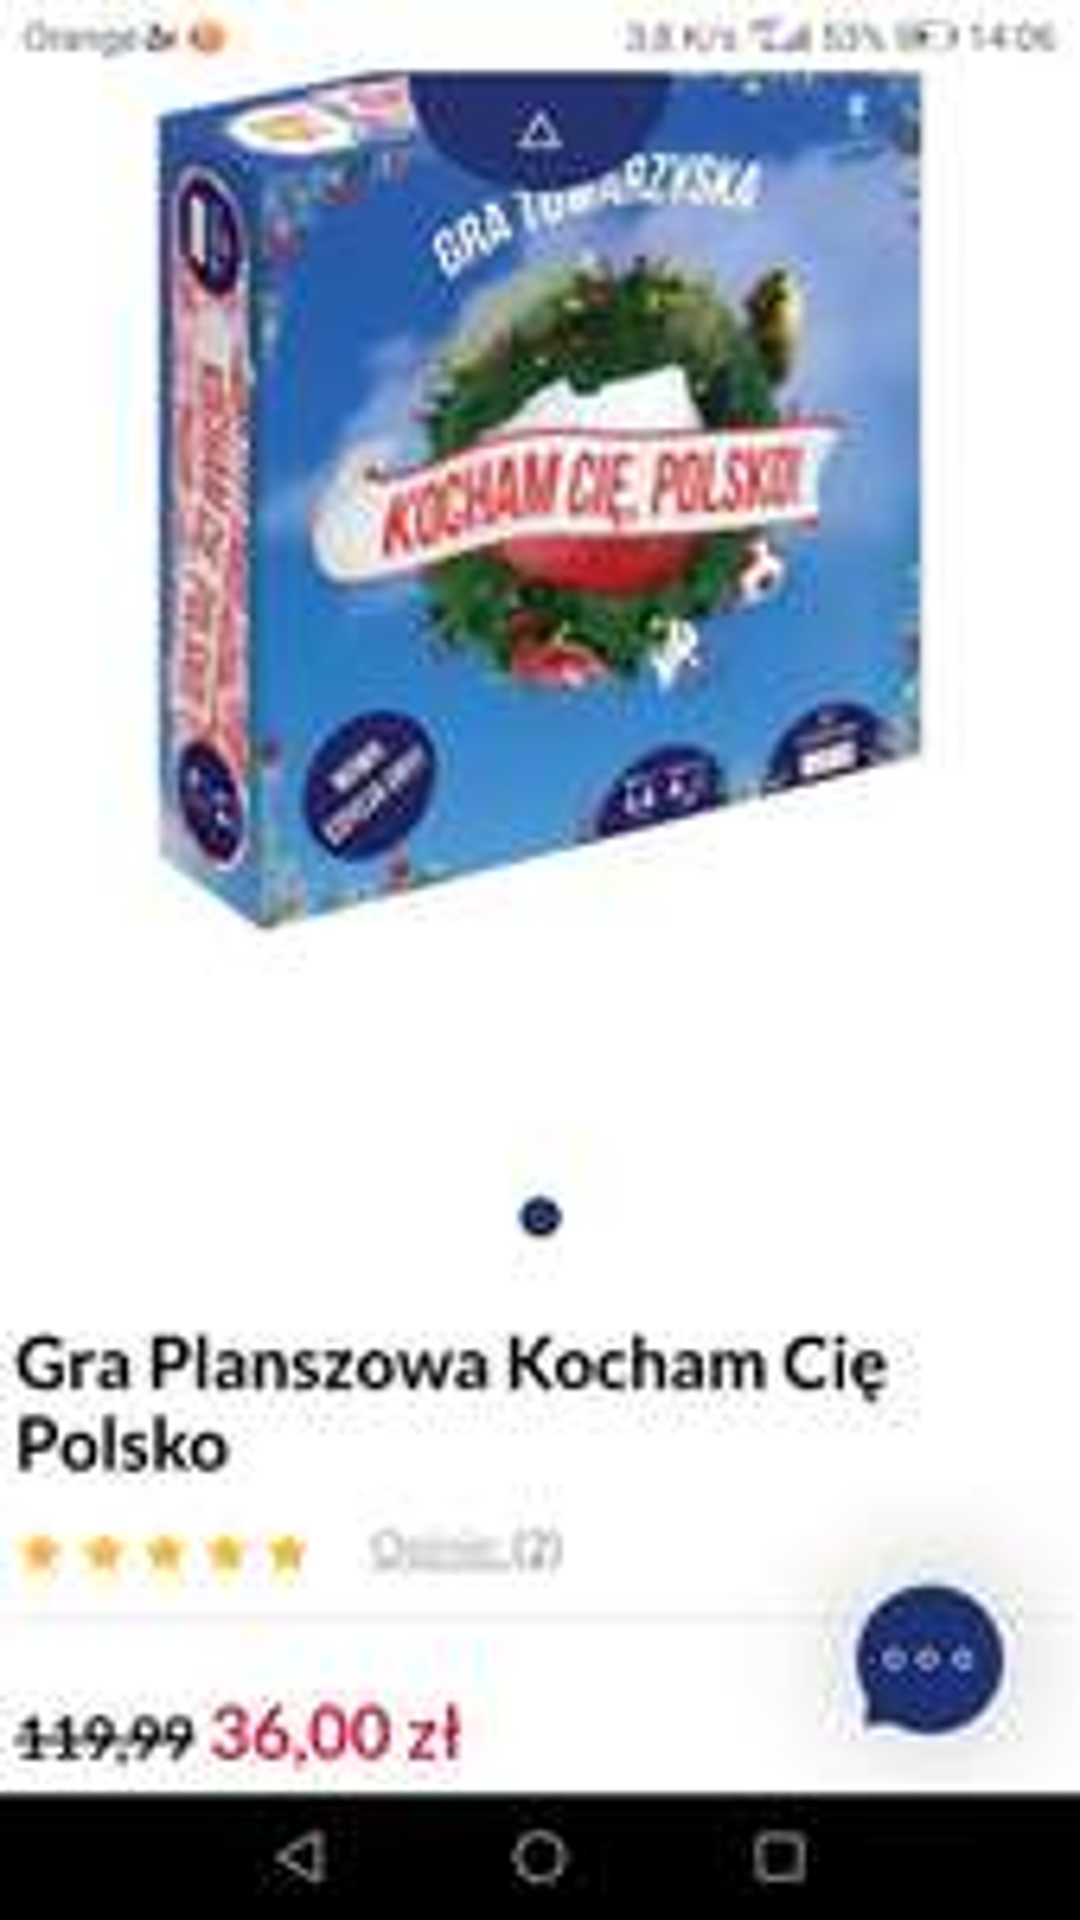 Gra Kocham Cie Polsko